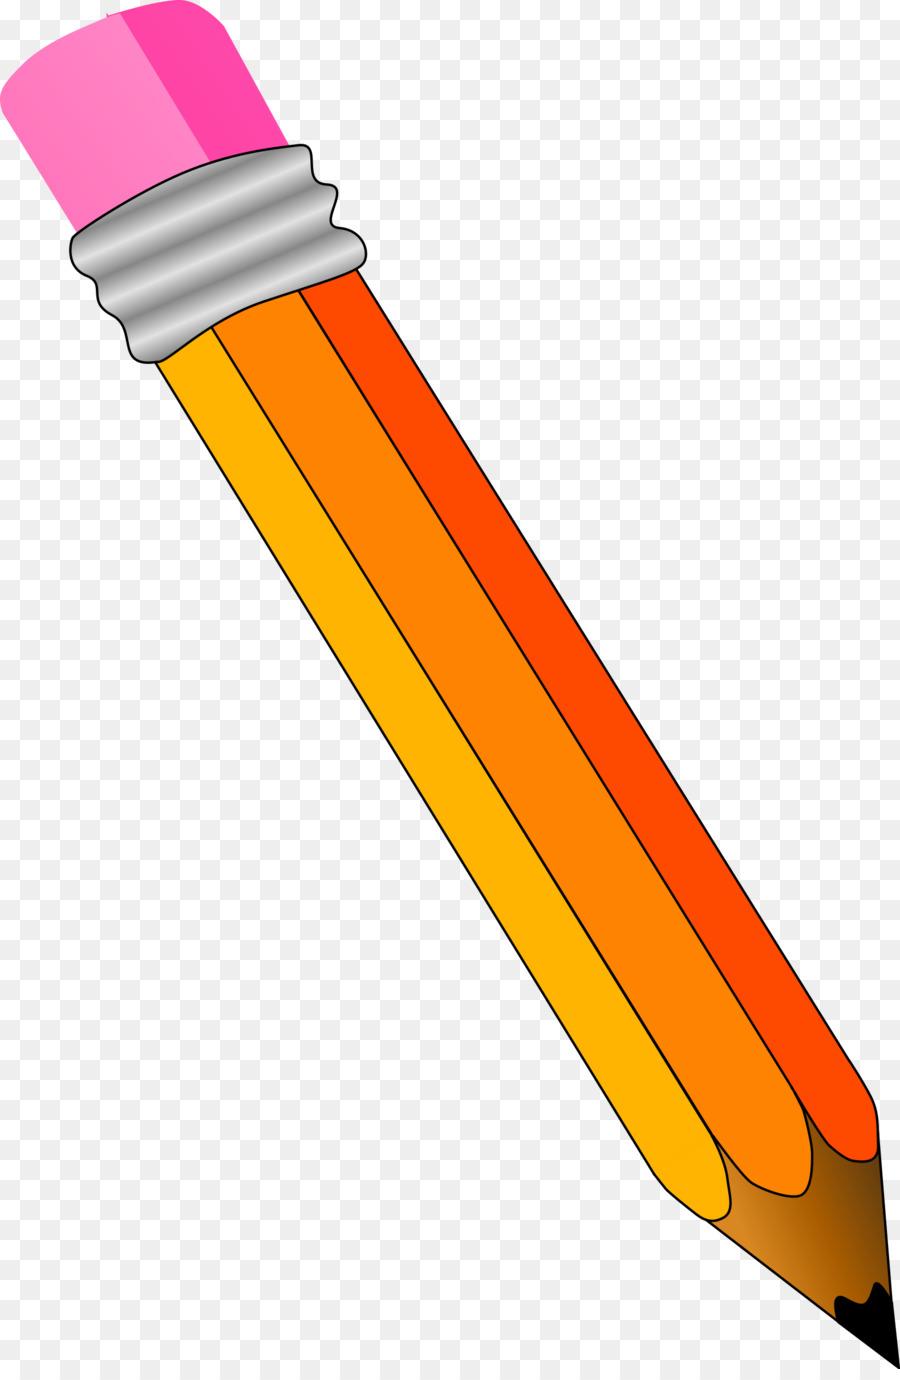 colored pencil clip art sharpened pencil cliparts png download